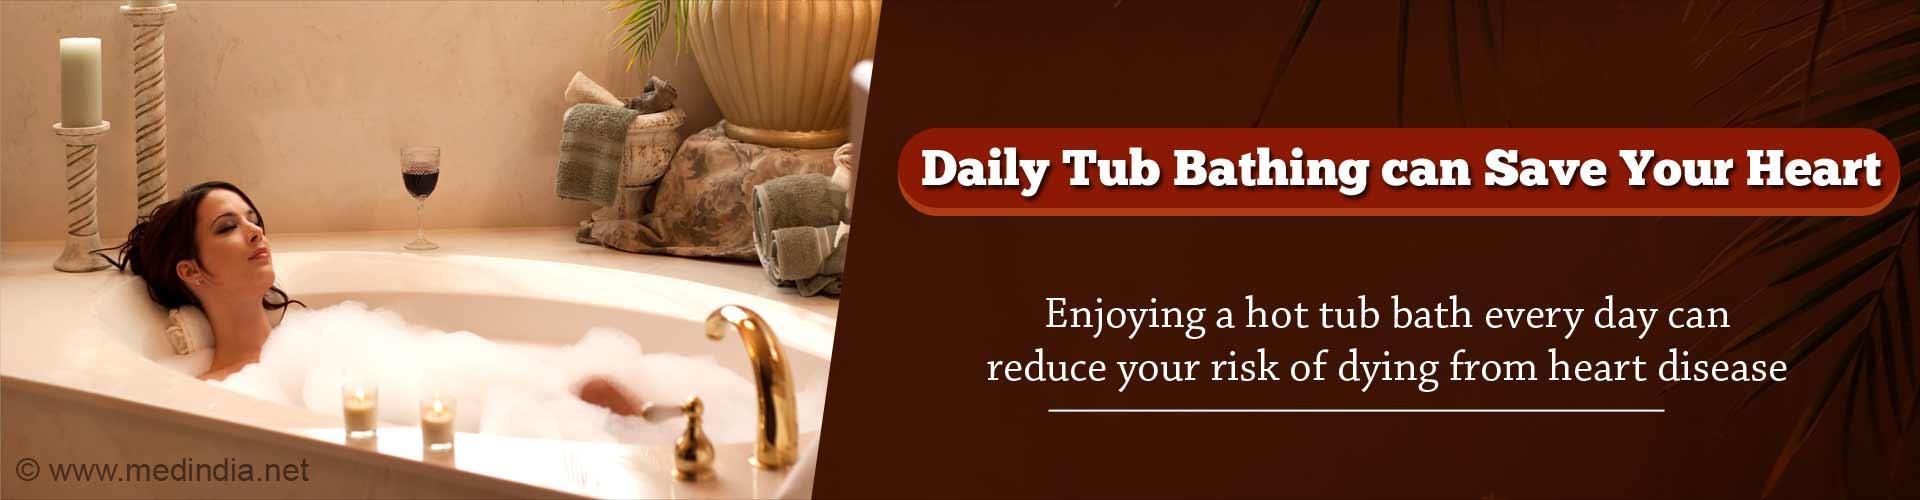 Regular Tub Bathing can Reduce Heart Disease Death Risk